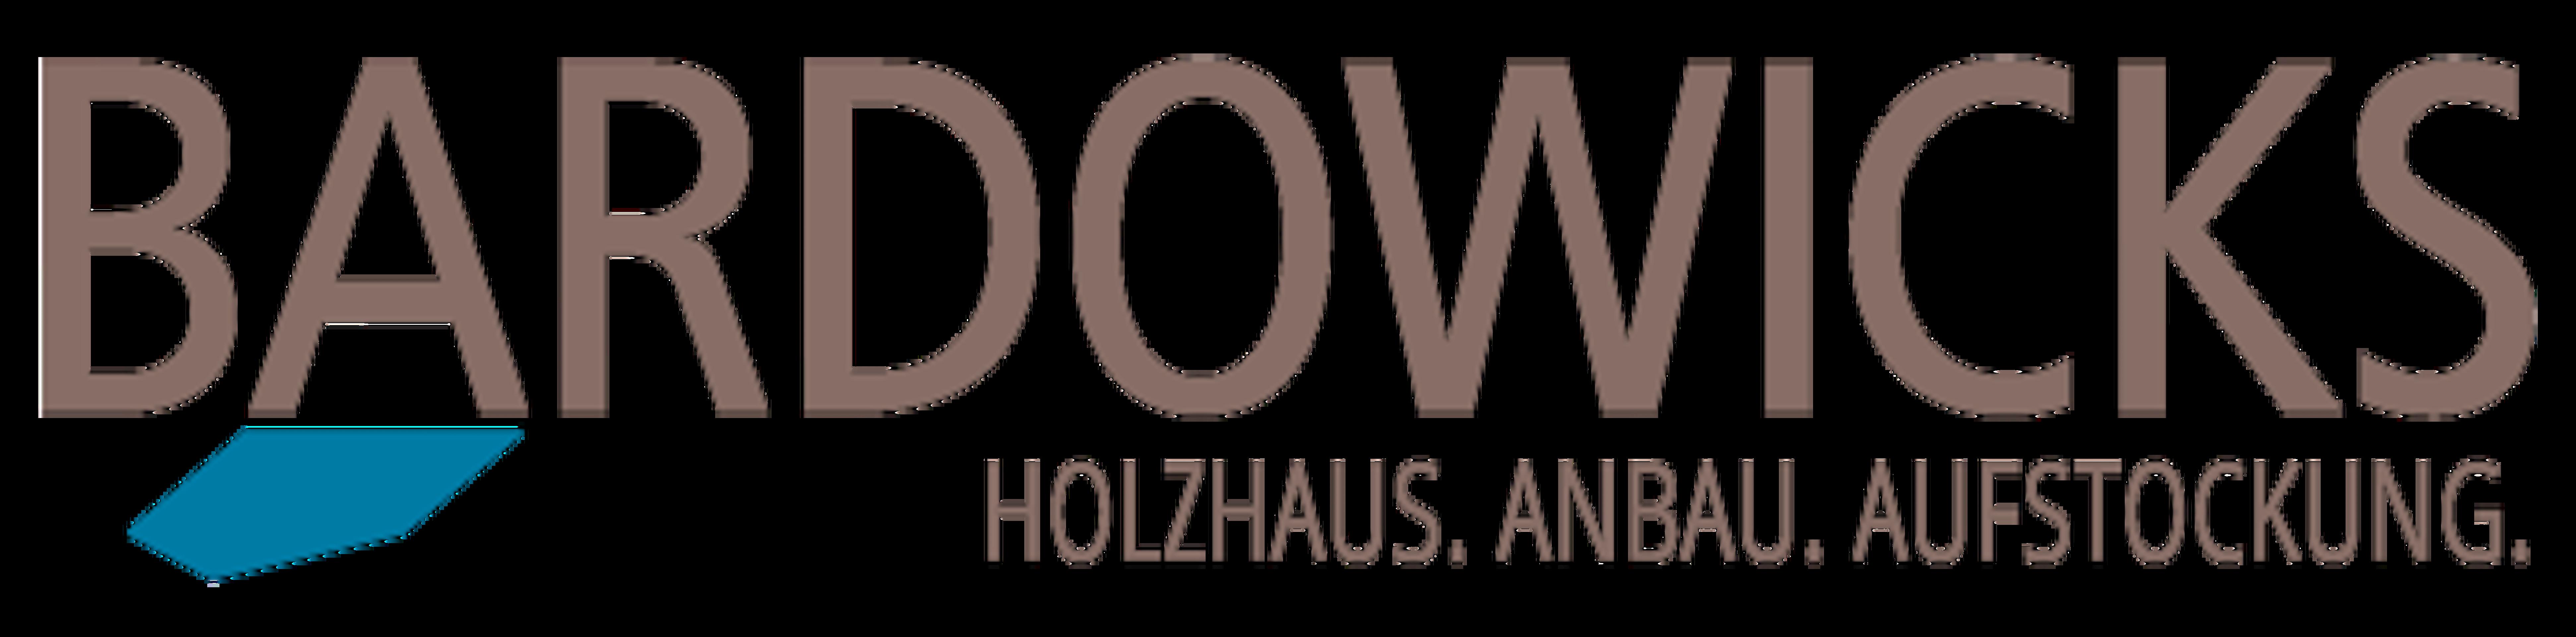 logo Bardowicks.Haus und Holzbau GmbH